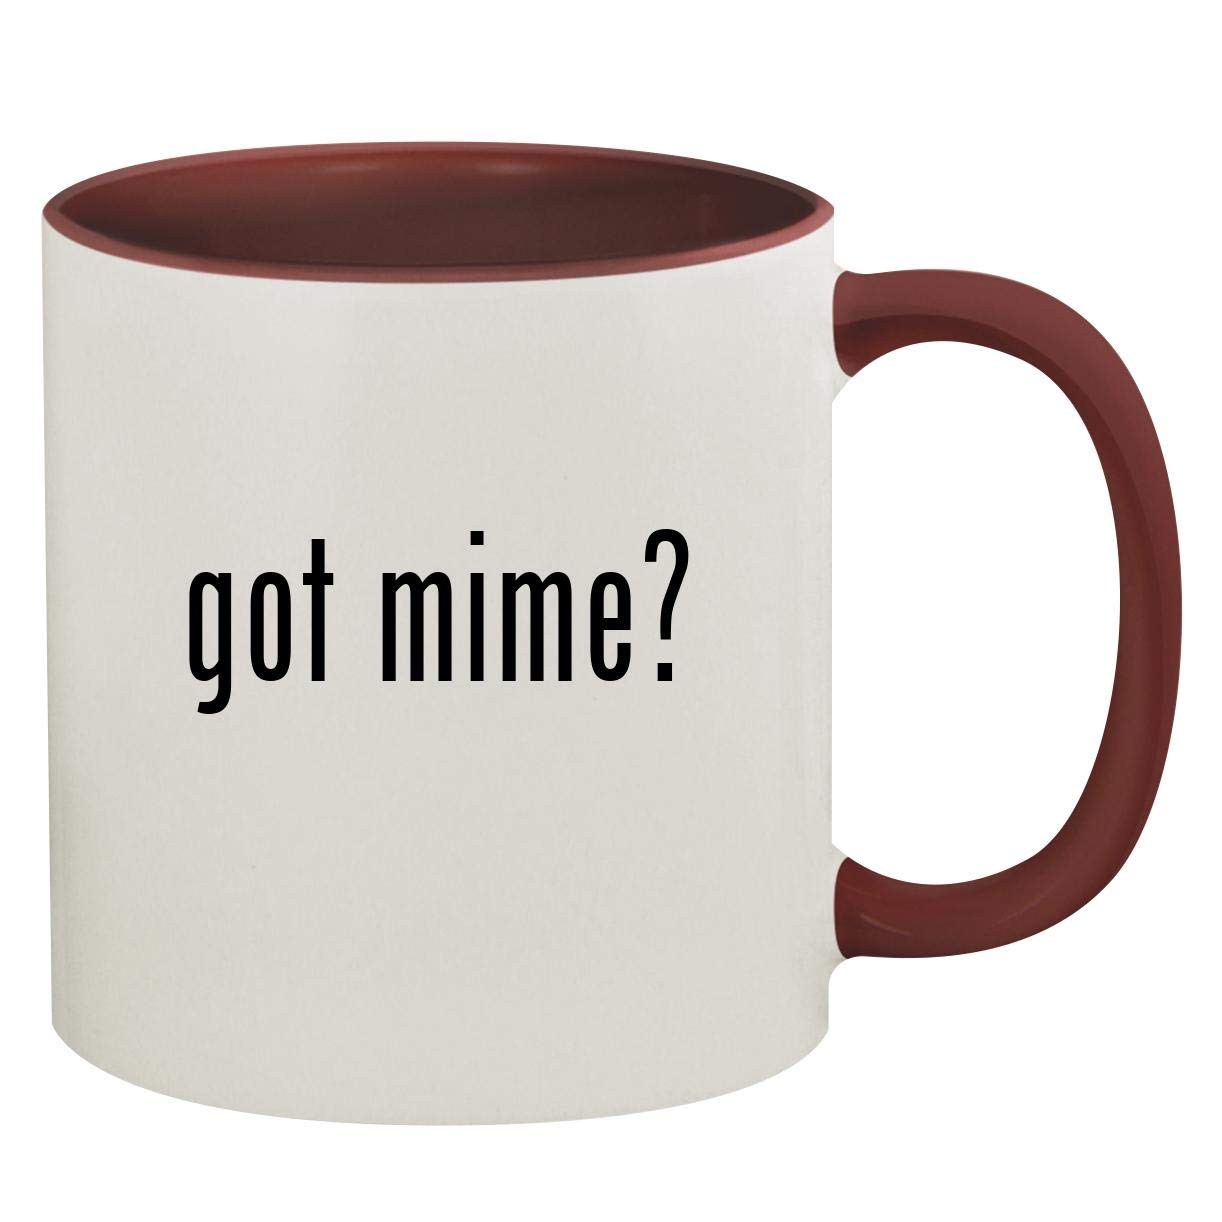 got mime? - 11oz Ceramic Colored Inside & Handle Coffee Mug, Maroon